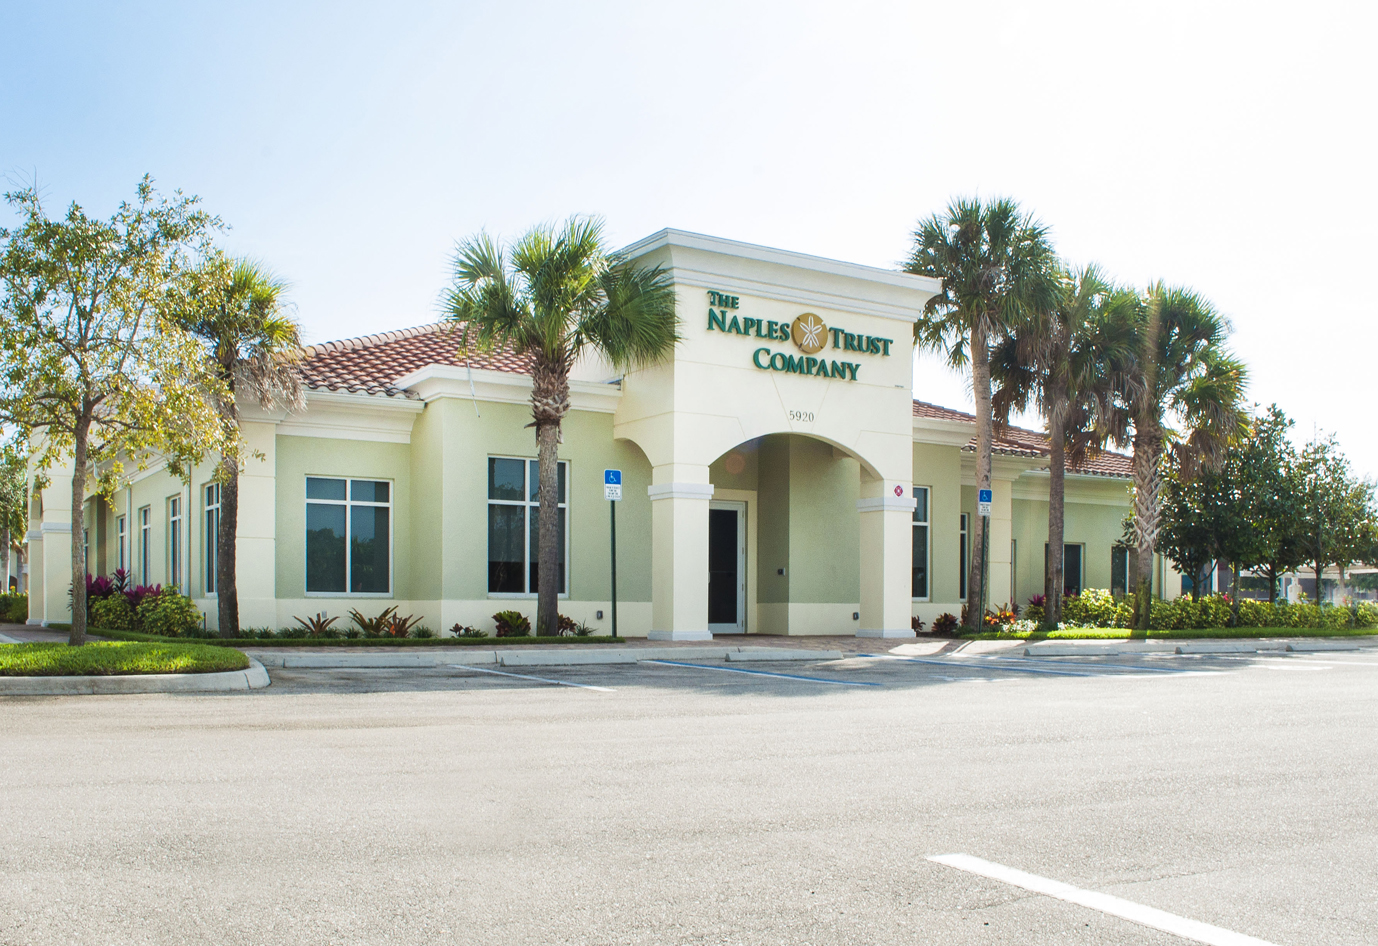 The Naples Trust Company